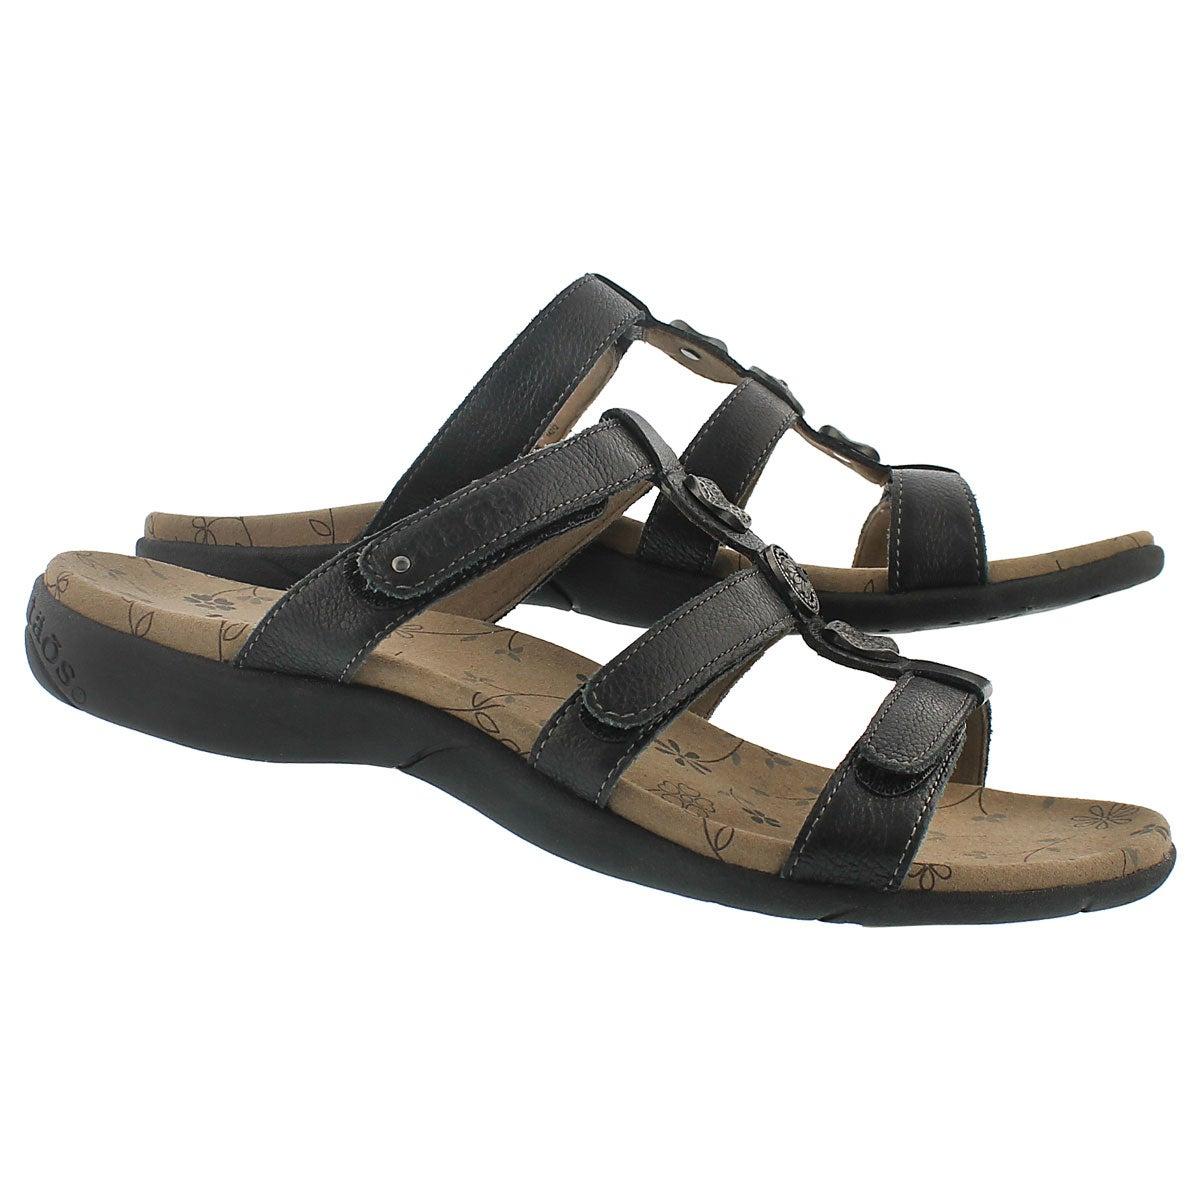 Lds Prize 2 black casual sandal